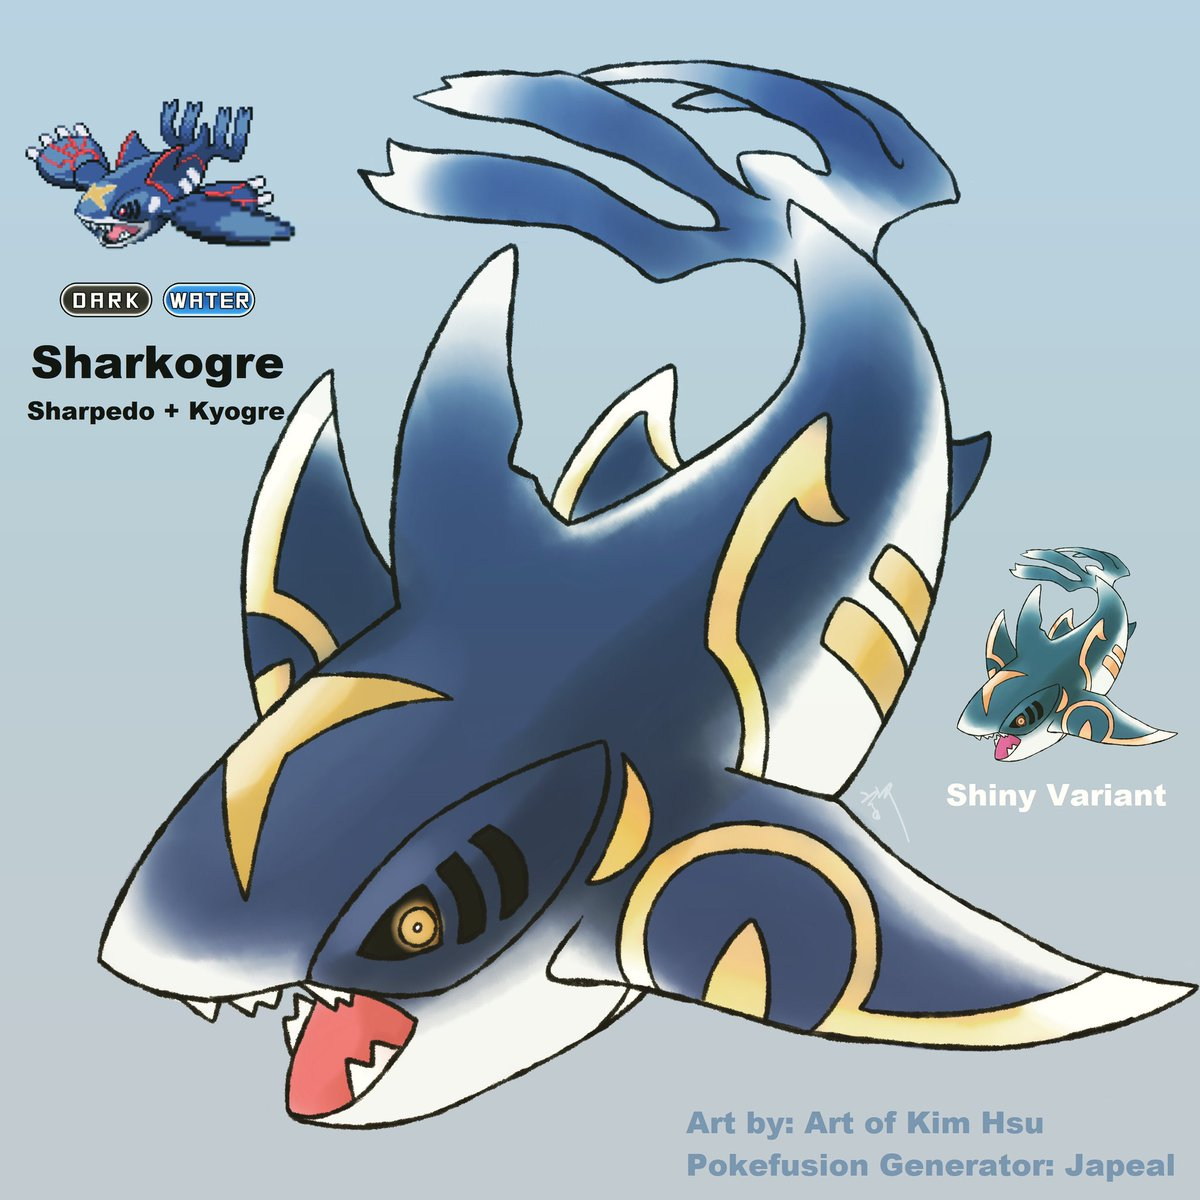 Sharpedo+Kyogre fusion. Feel free to suggest more fusions! #sharpedo #kyogre #shark #hoenn #fakemon #pokefusion #pokemon #greatwhite #kensugimoristyle #conceptart #japealpic.twitter.com/49zD7tXTep